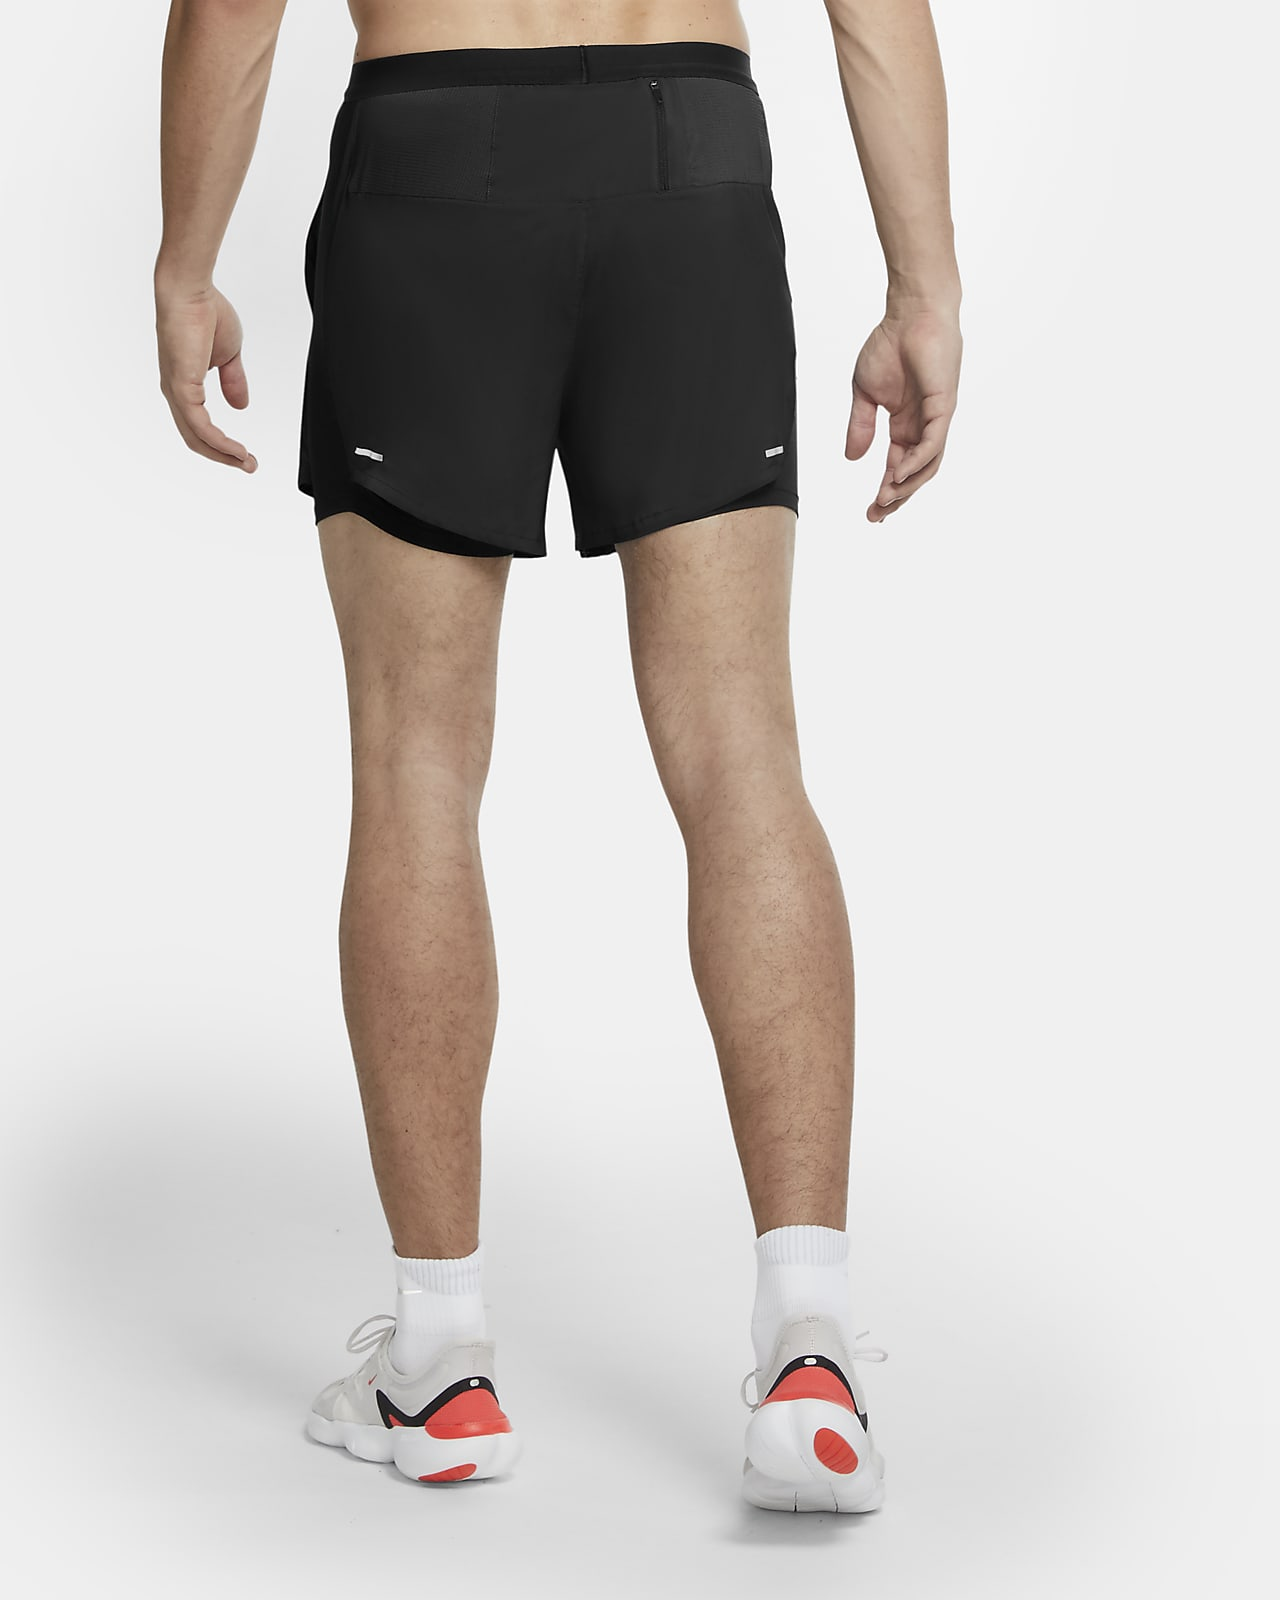 Nike Flex Stride Future Fast Men's 2-In